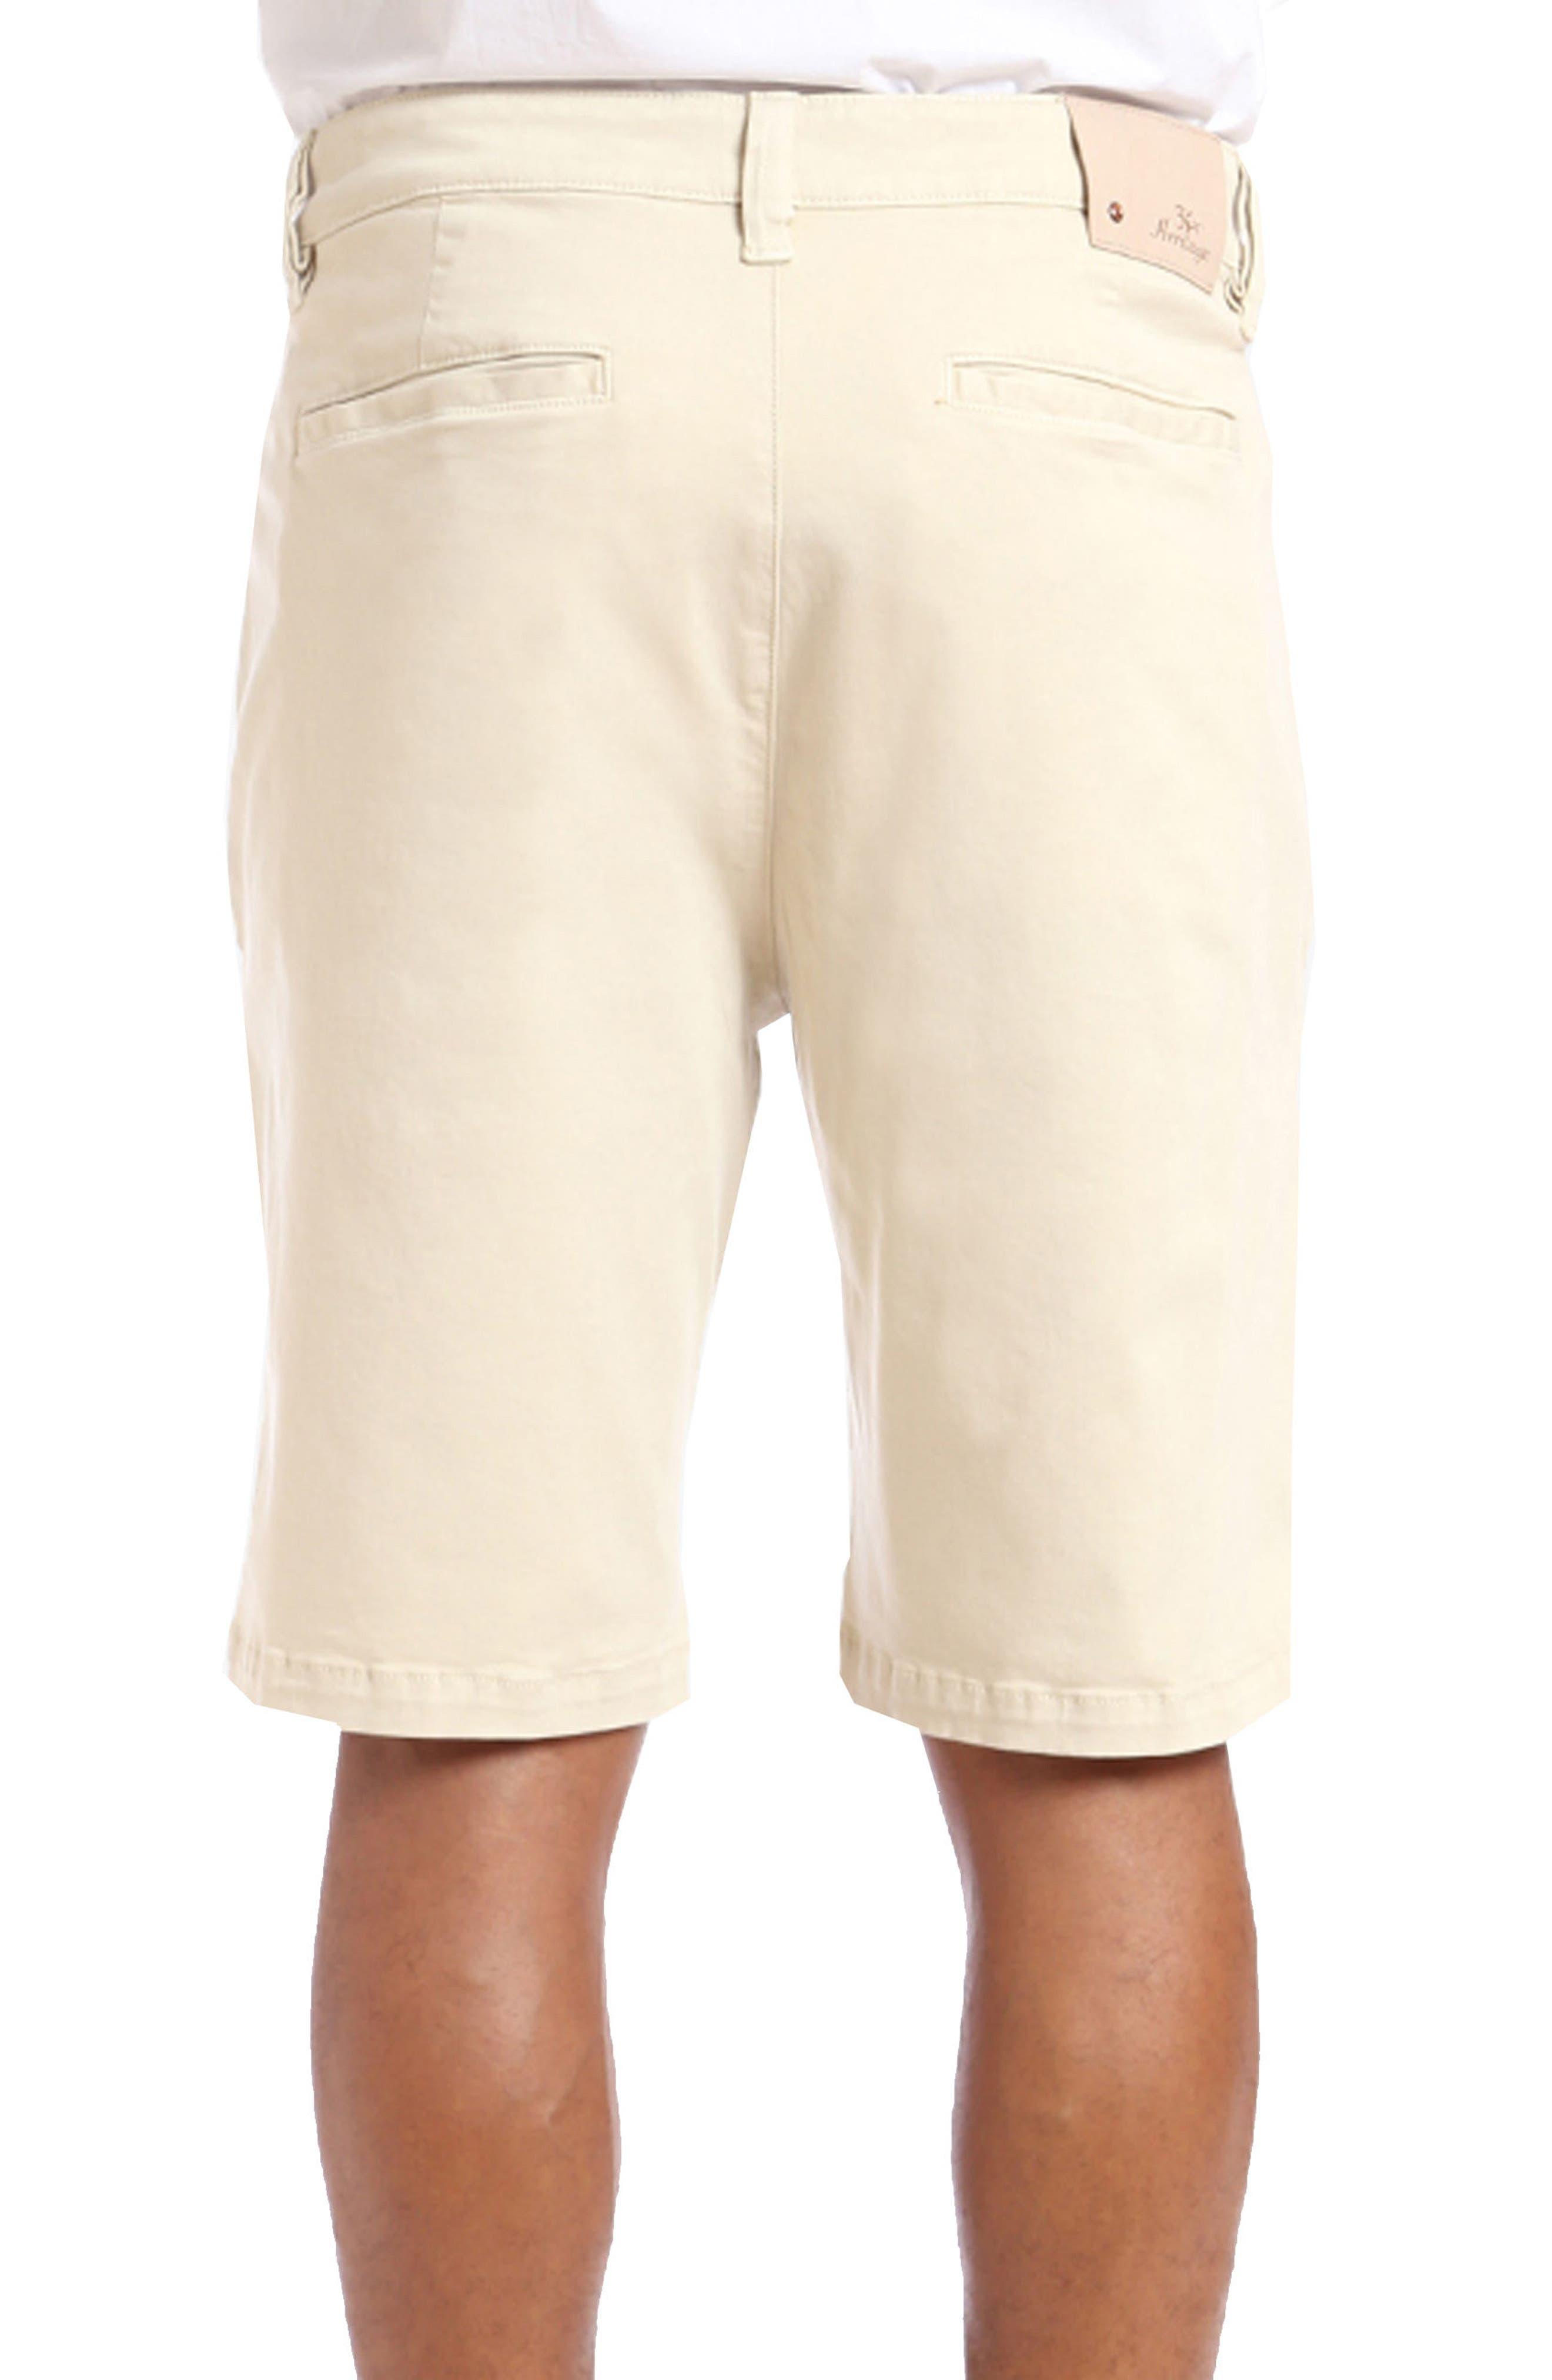 Nevada Twill Shorts,                             Alternate thumbnail 2, color,                             Bone Twill